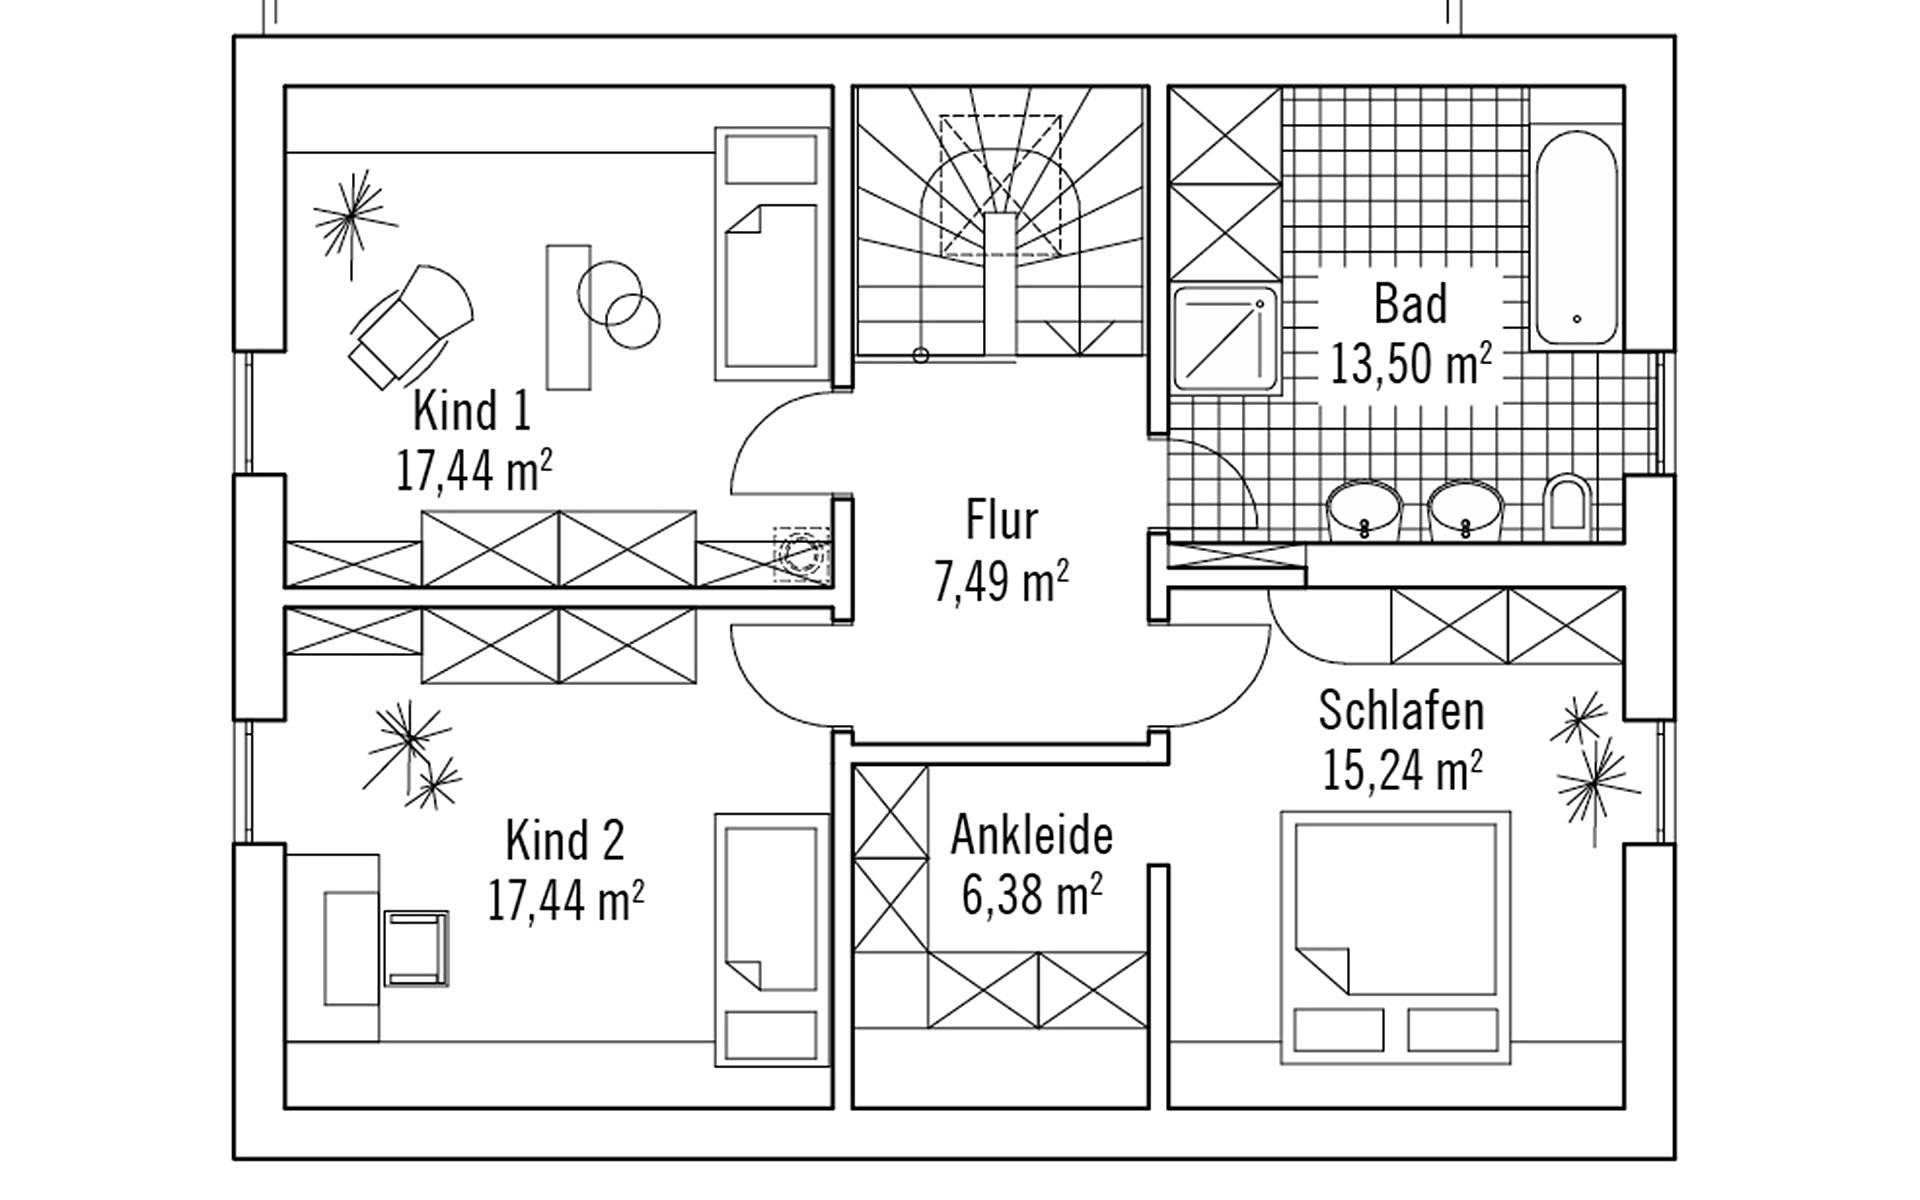 Obergeschoss Skandinavisch 155m² von Bau-Fritz GmbH & Co. KG, seit 1896